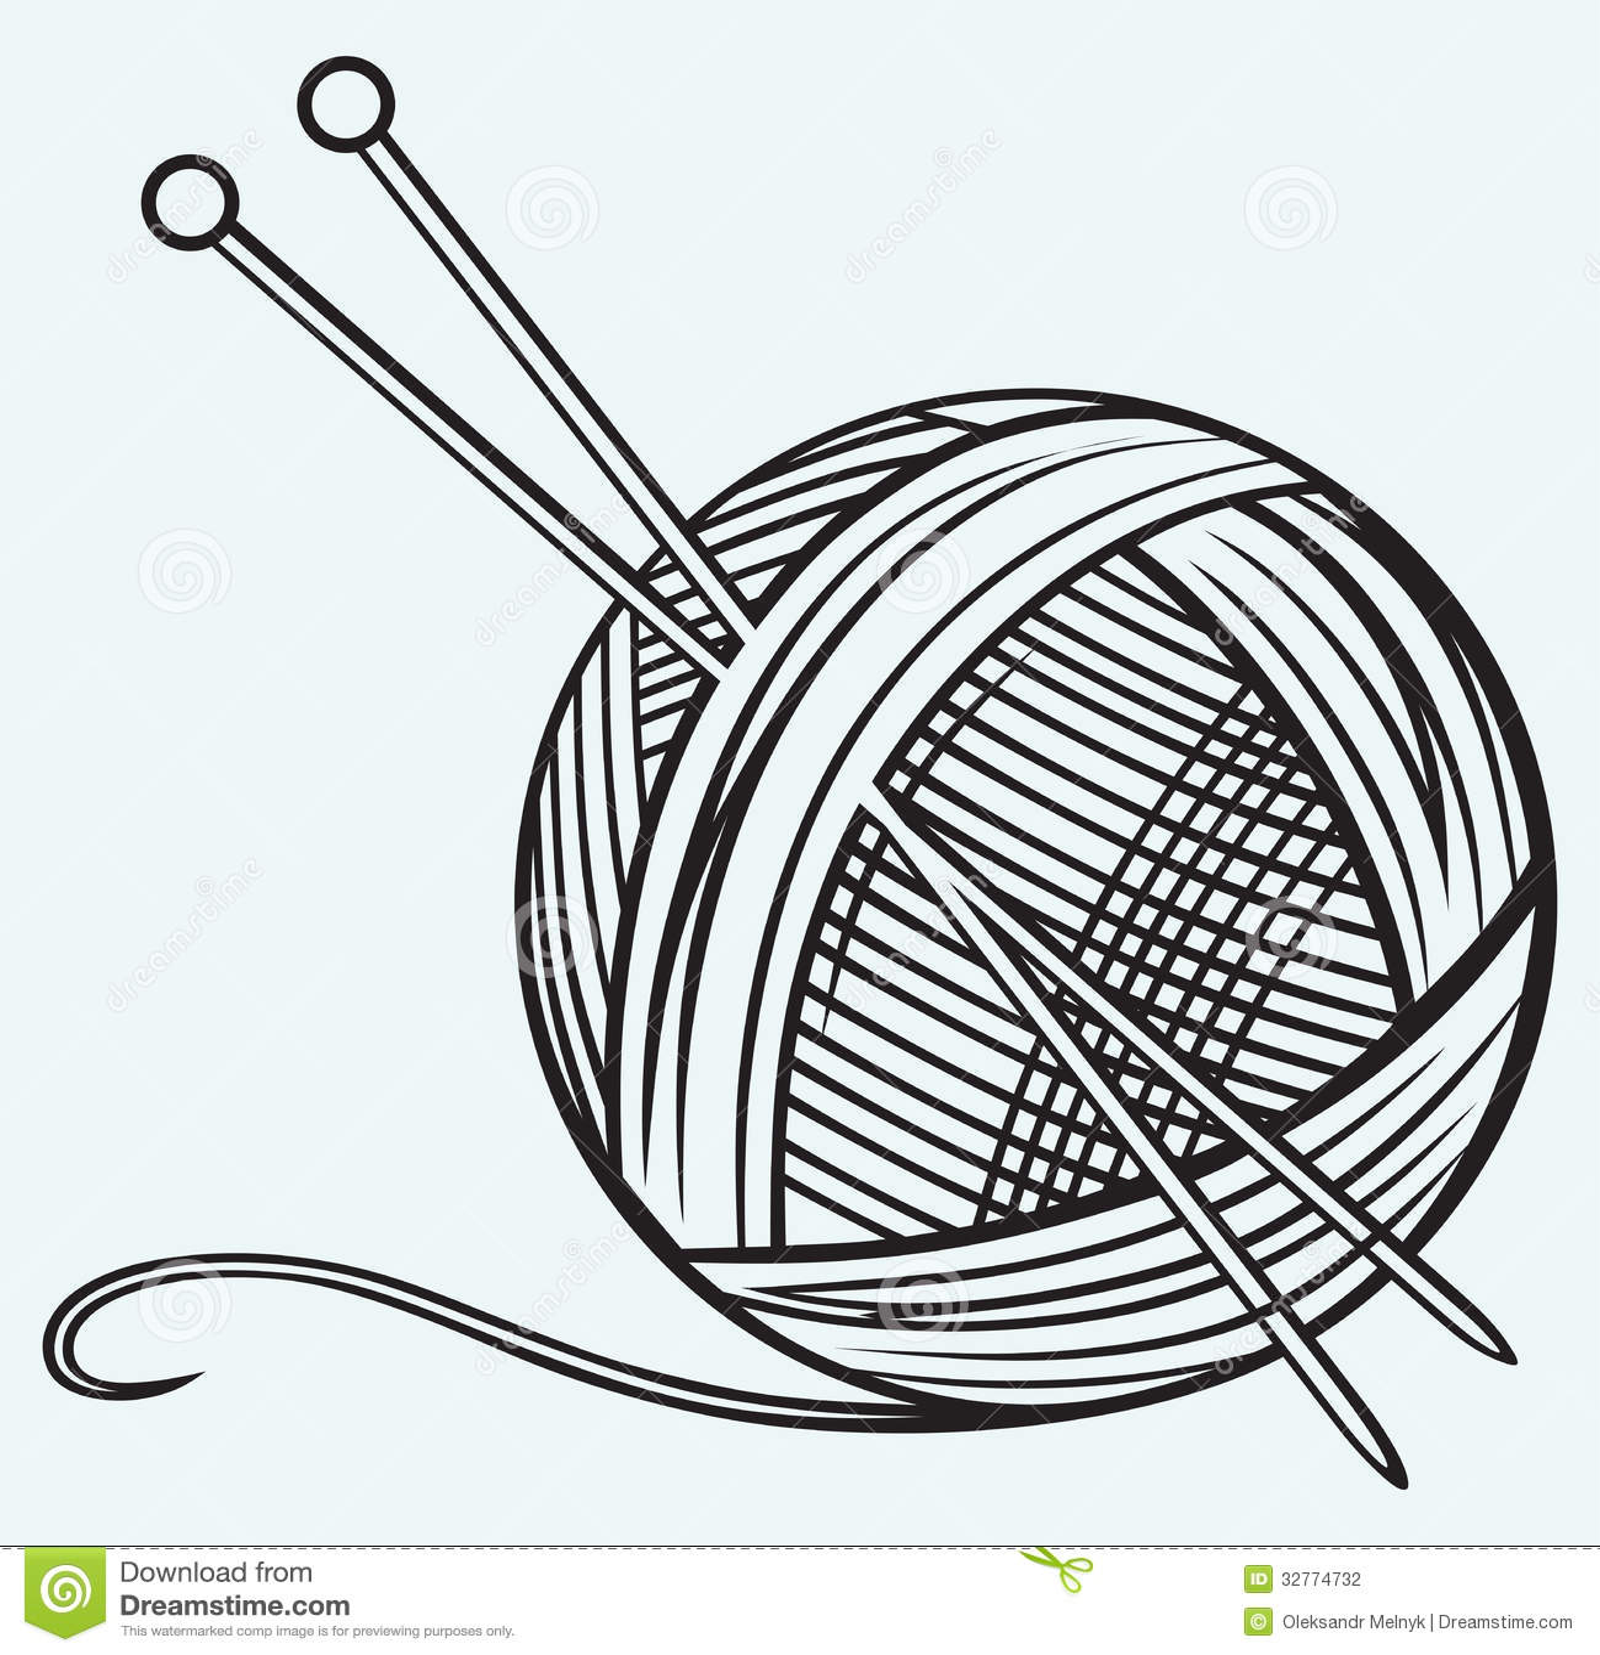 ball of yarn and needles illustration 32774732 megapixl